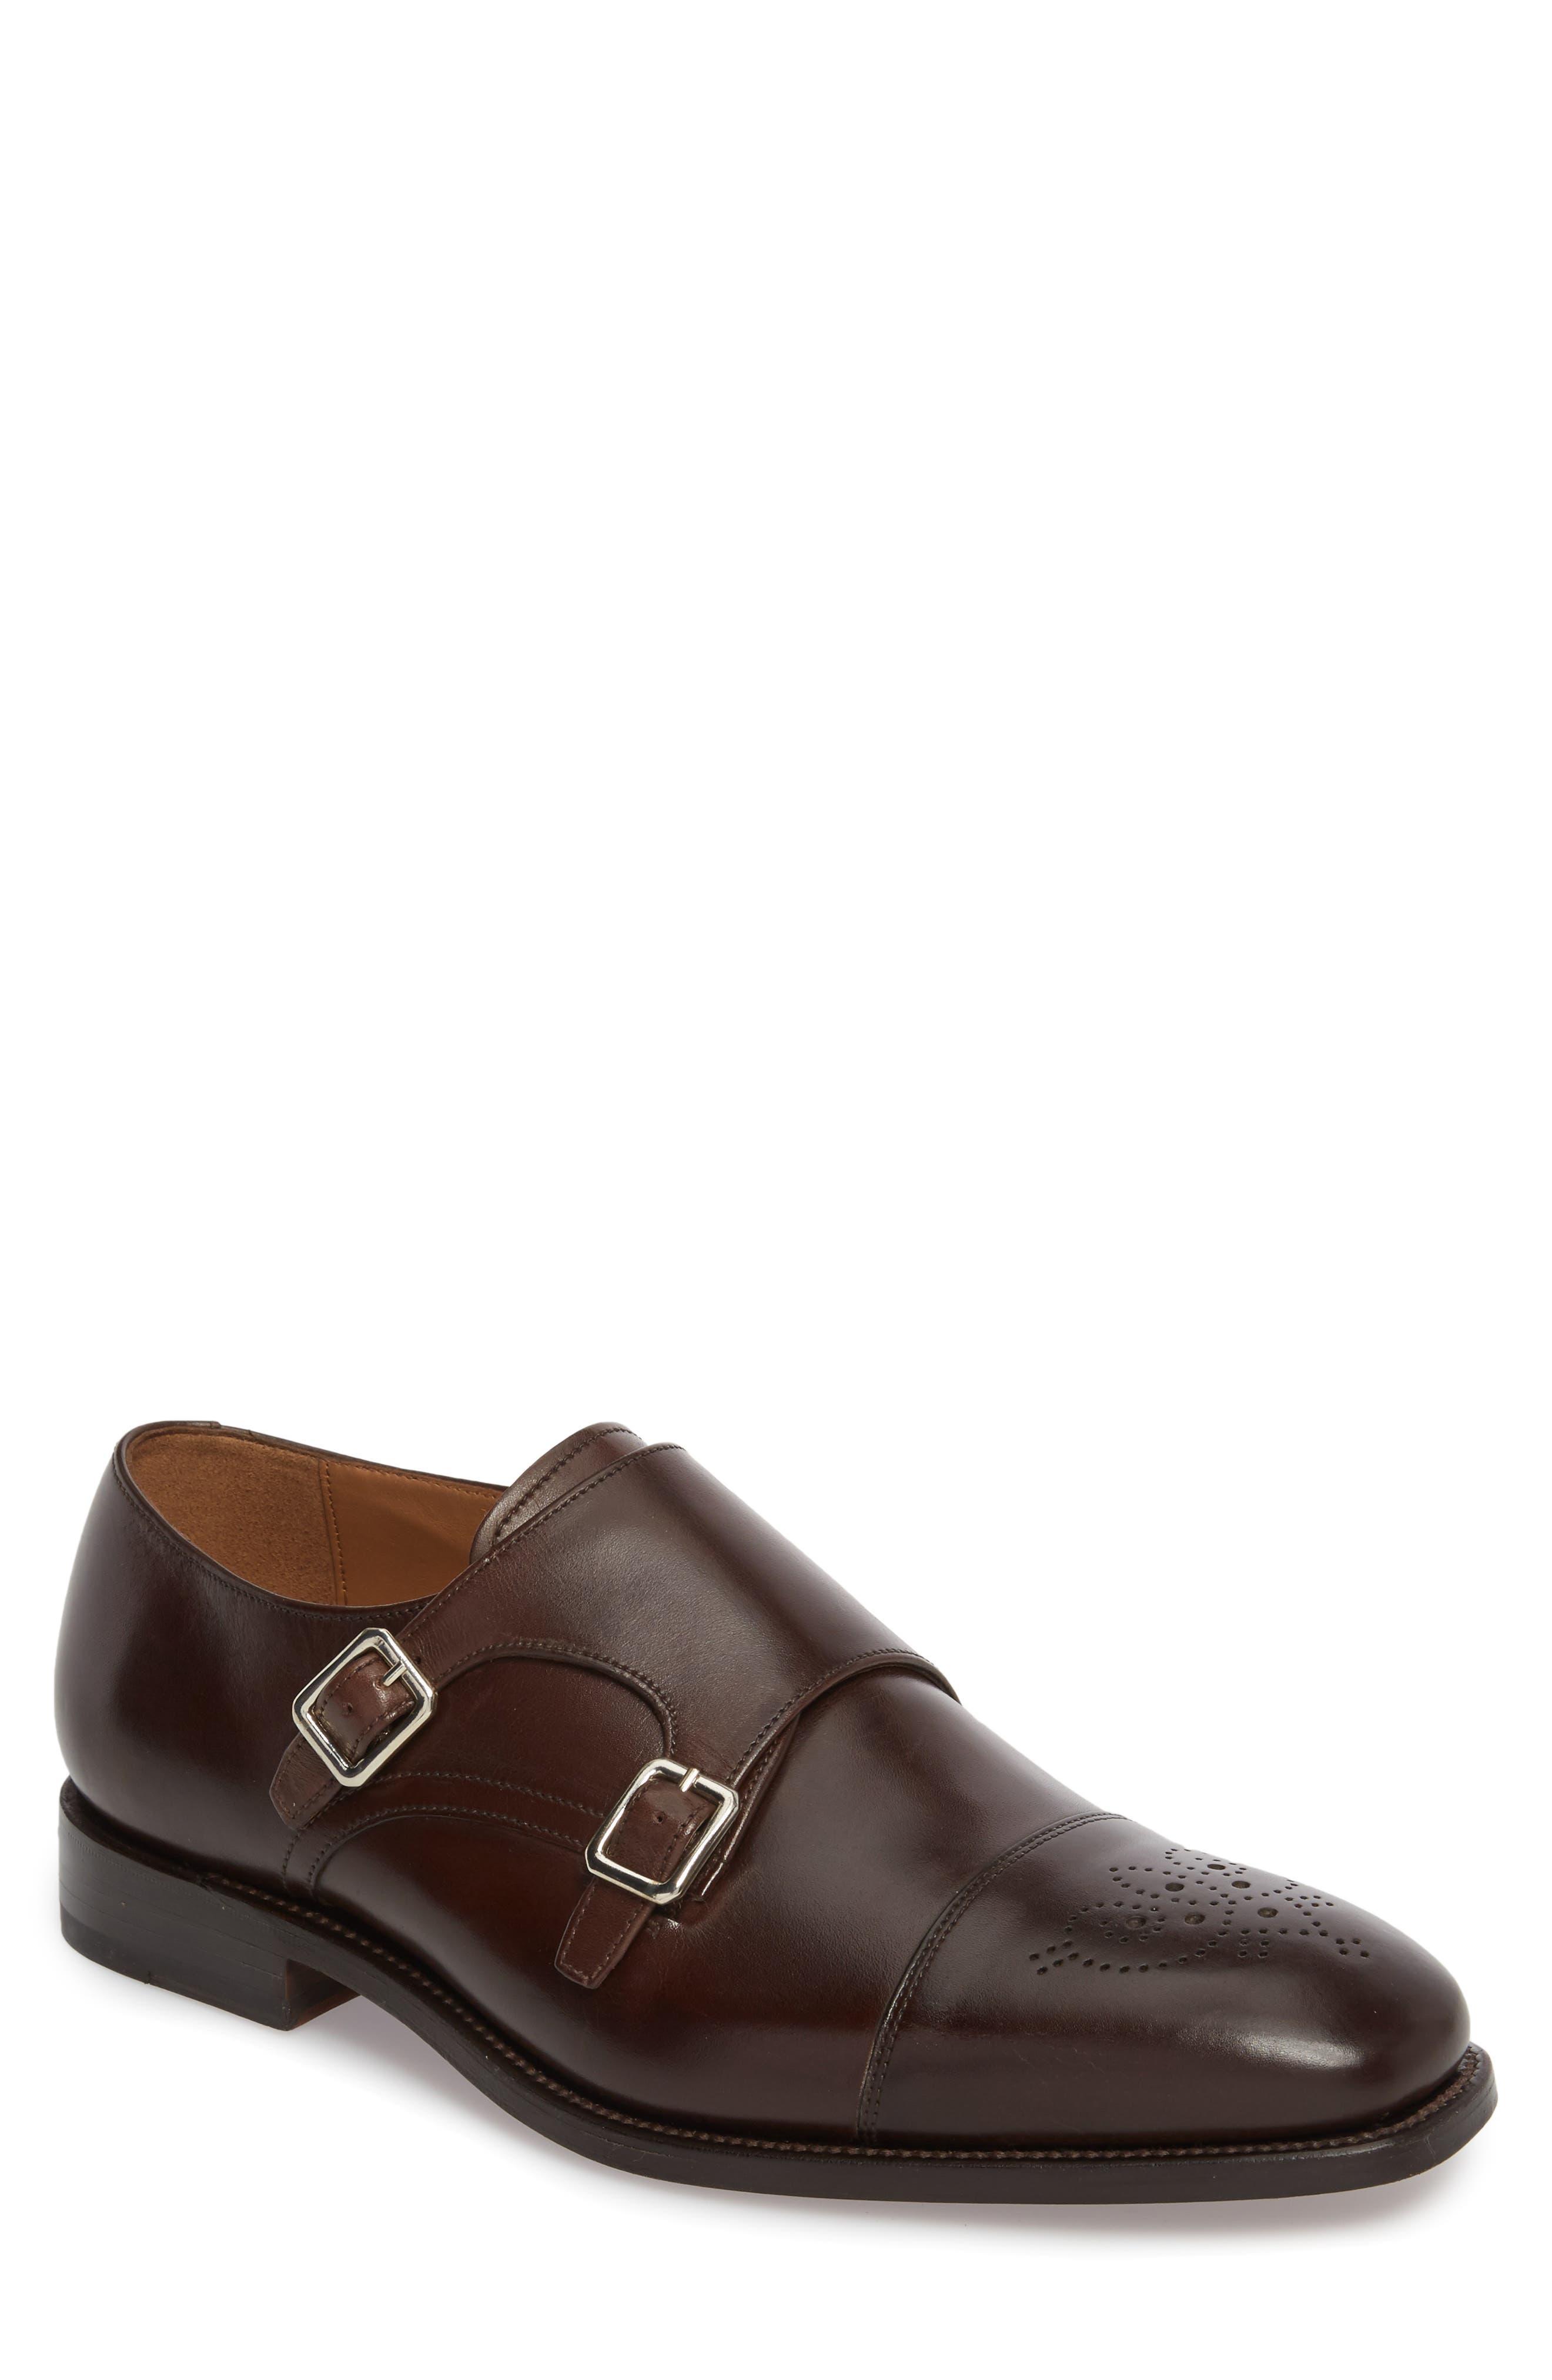 Robert Talbott Sausalito Double Monk Strap Shoe (Men)